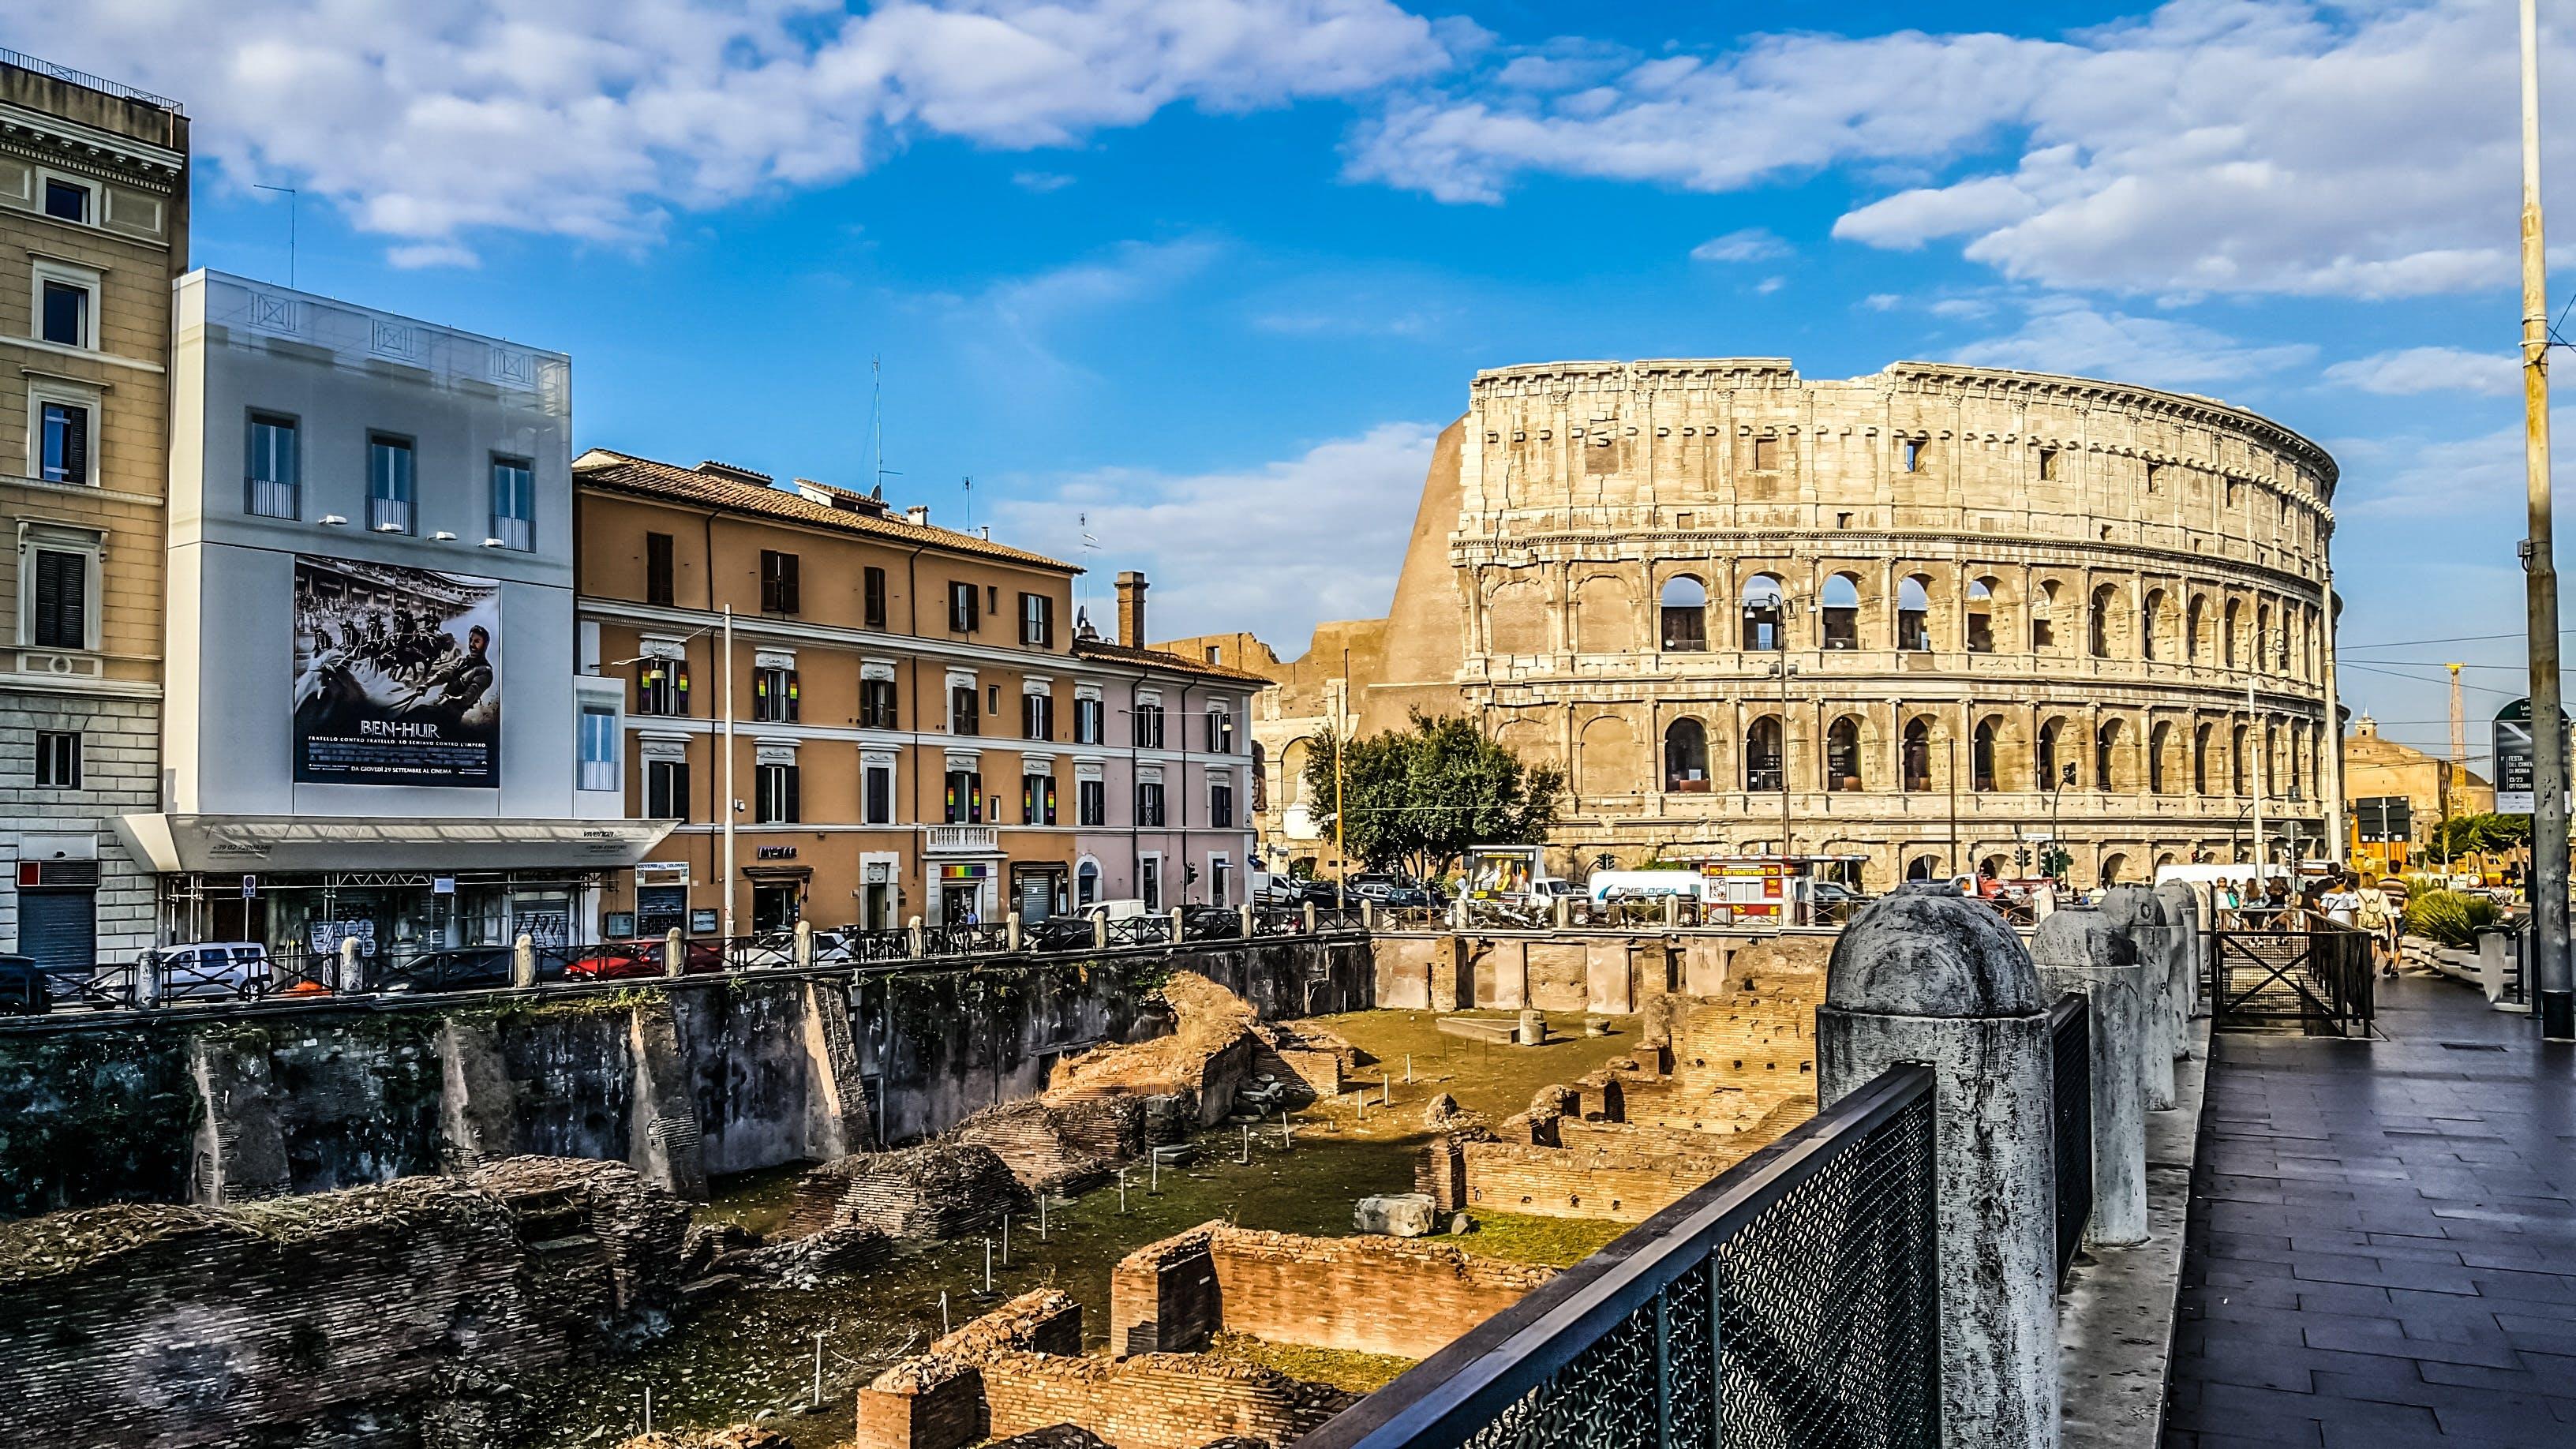 ancient, architecture, arena